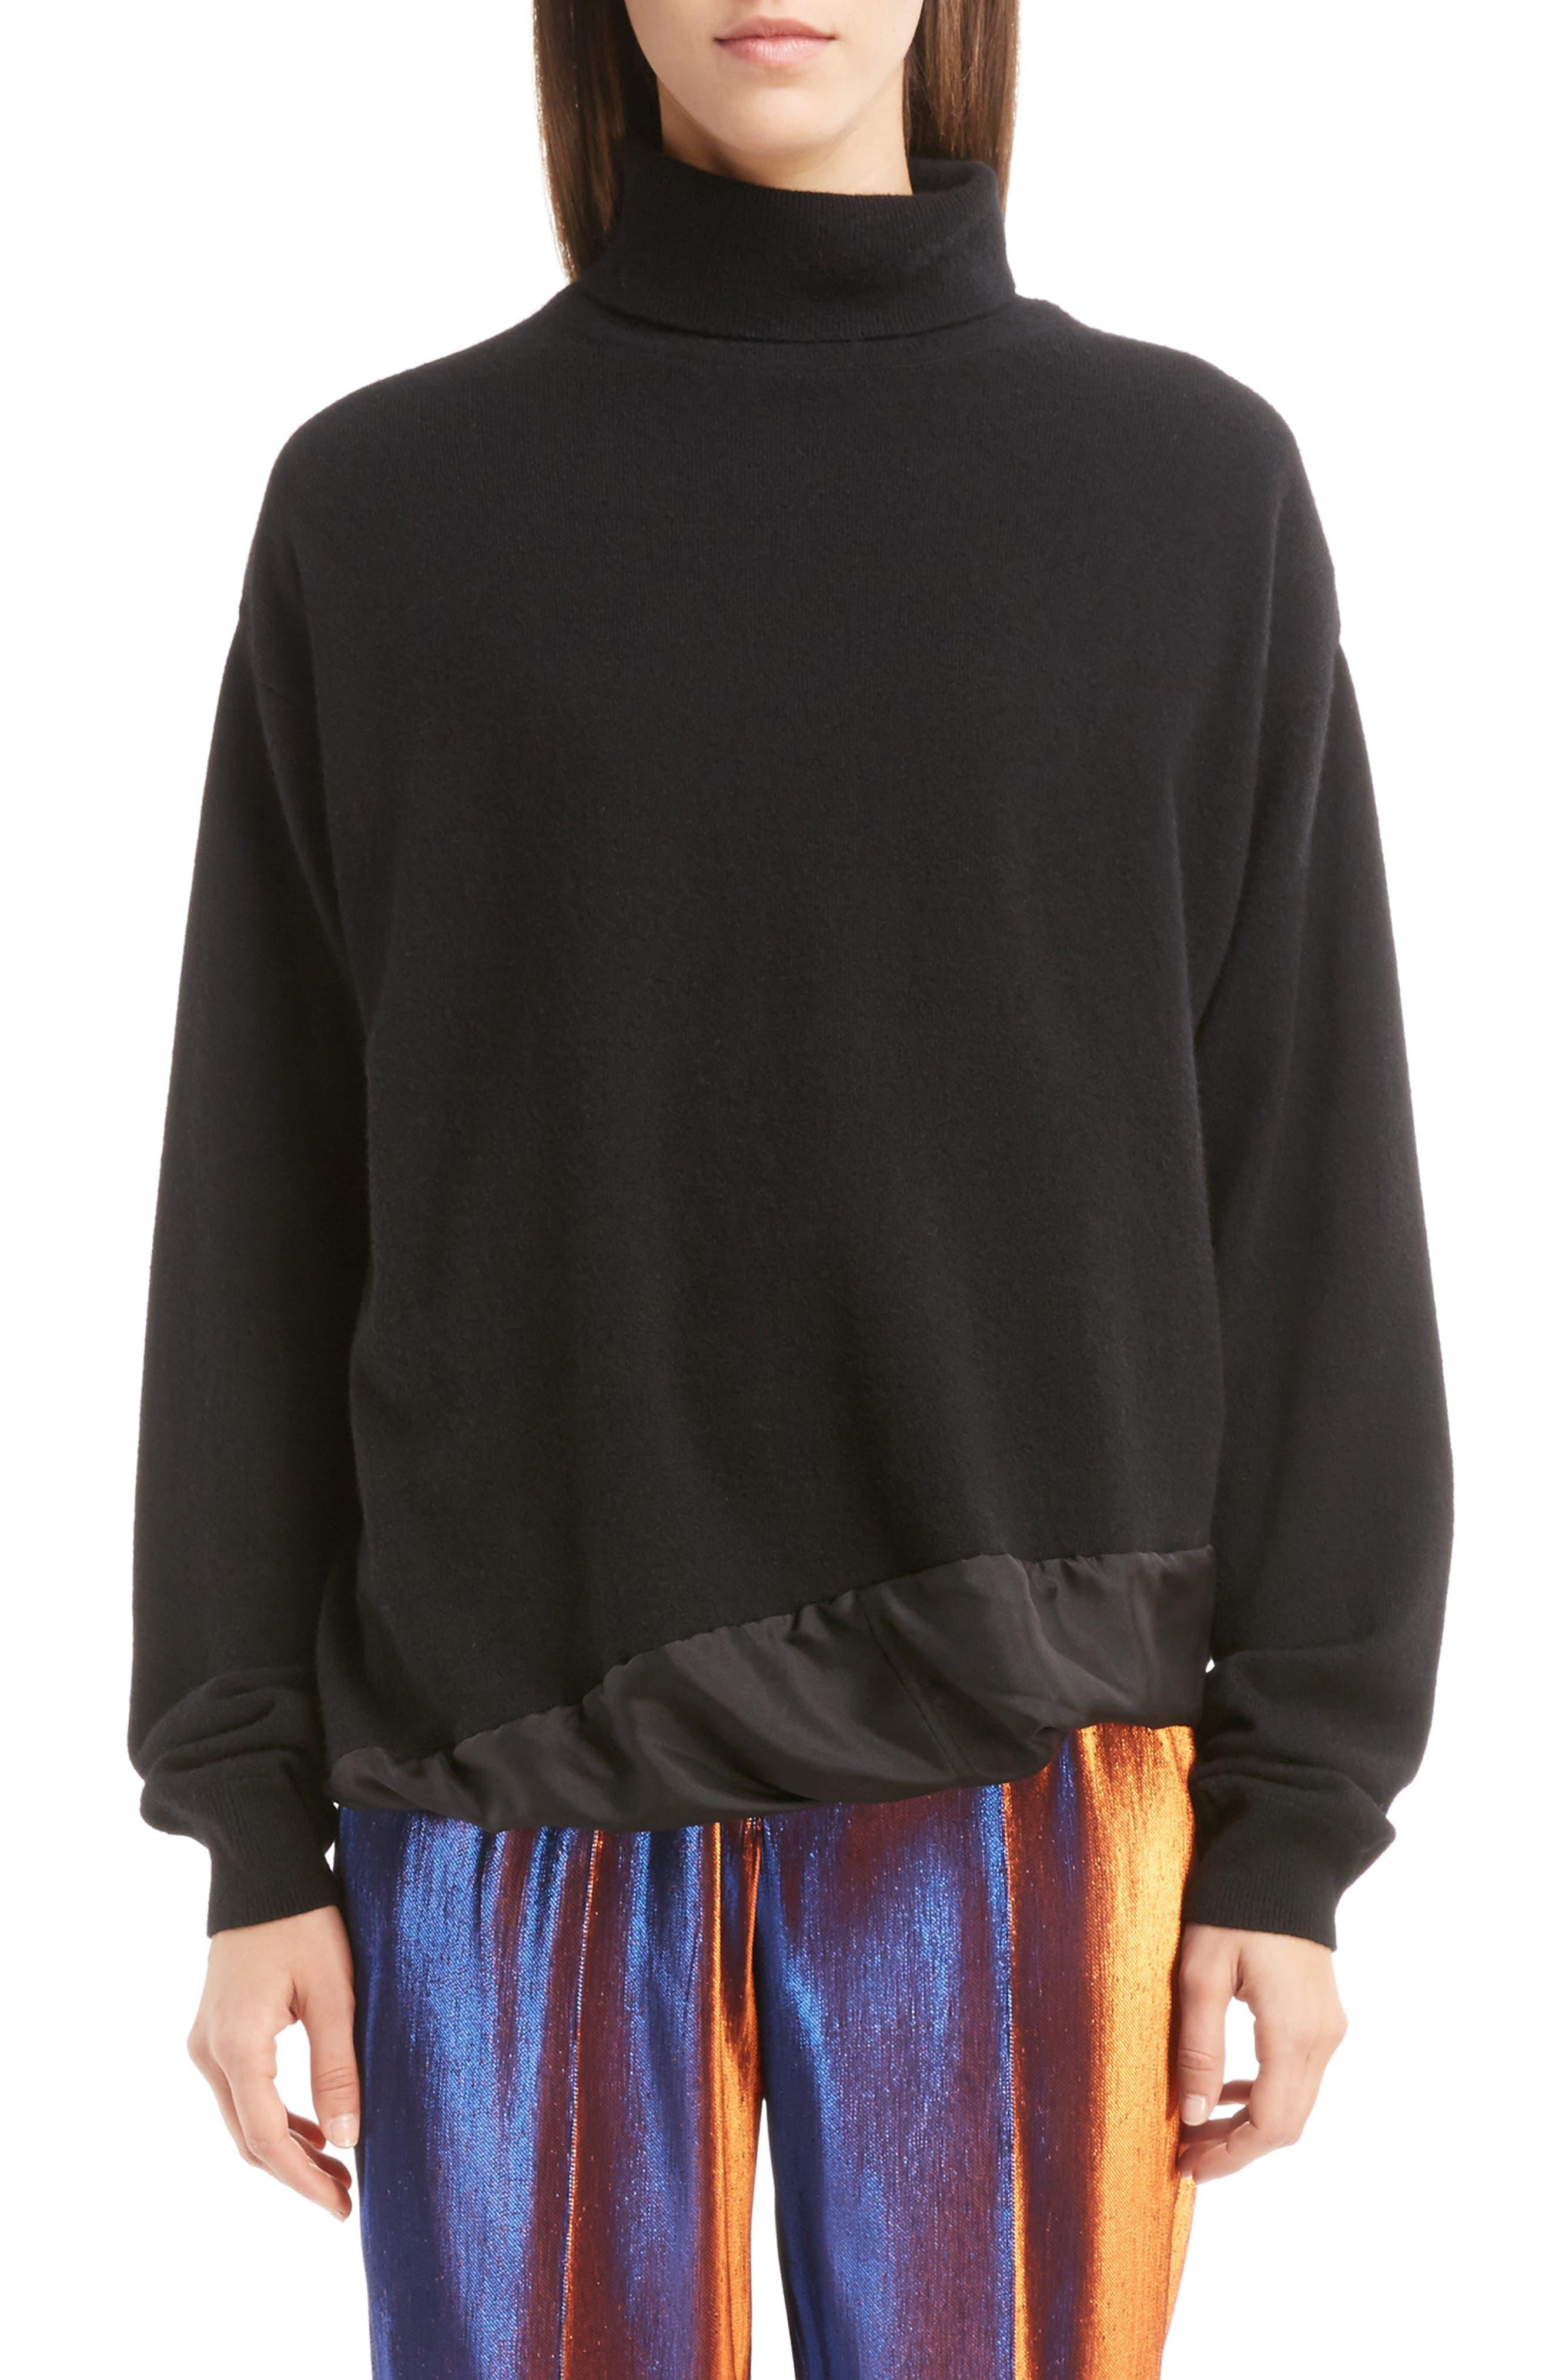 Alternate Image 1 Selected - Dries Van Noten Silk Hem Cashmere Turtleneck Sweater